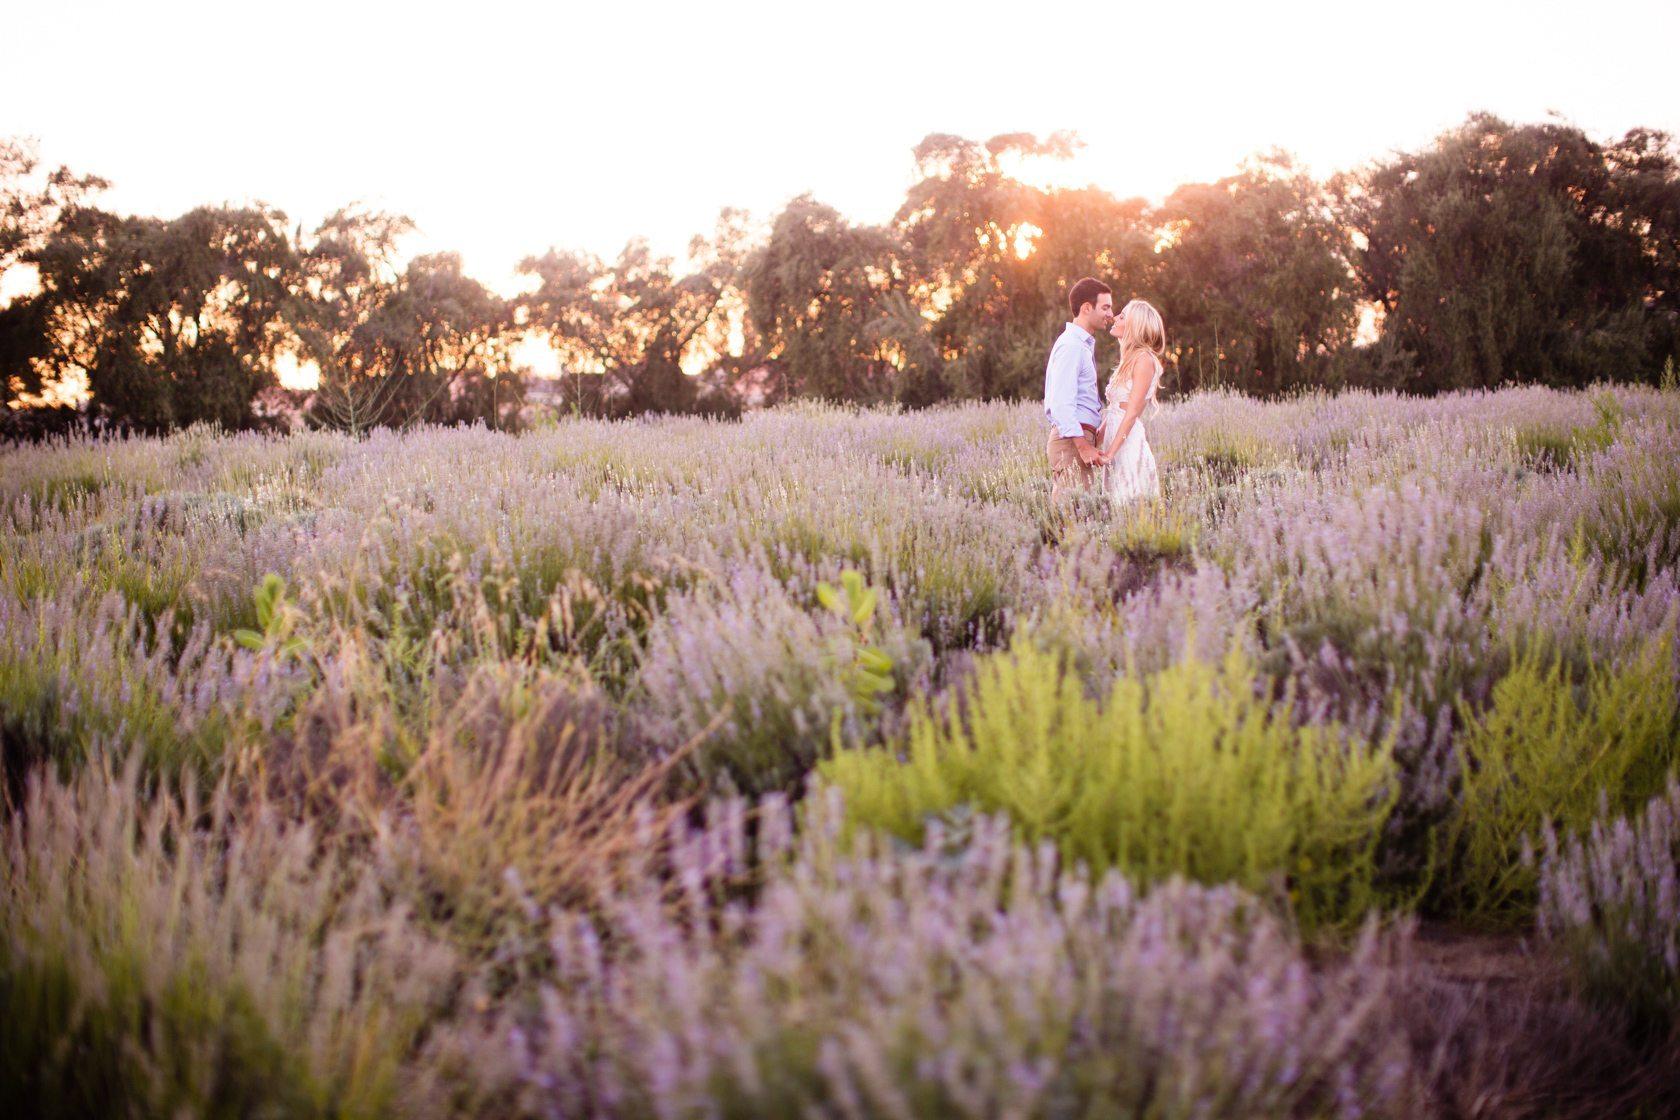 Highland_Springs_Lavender_Field_Engagement_05.jpg